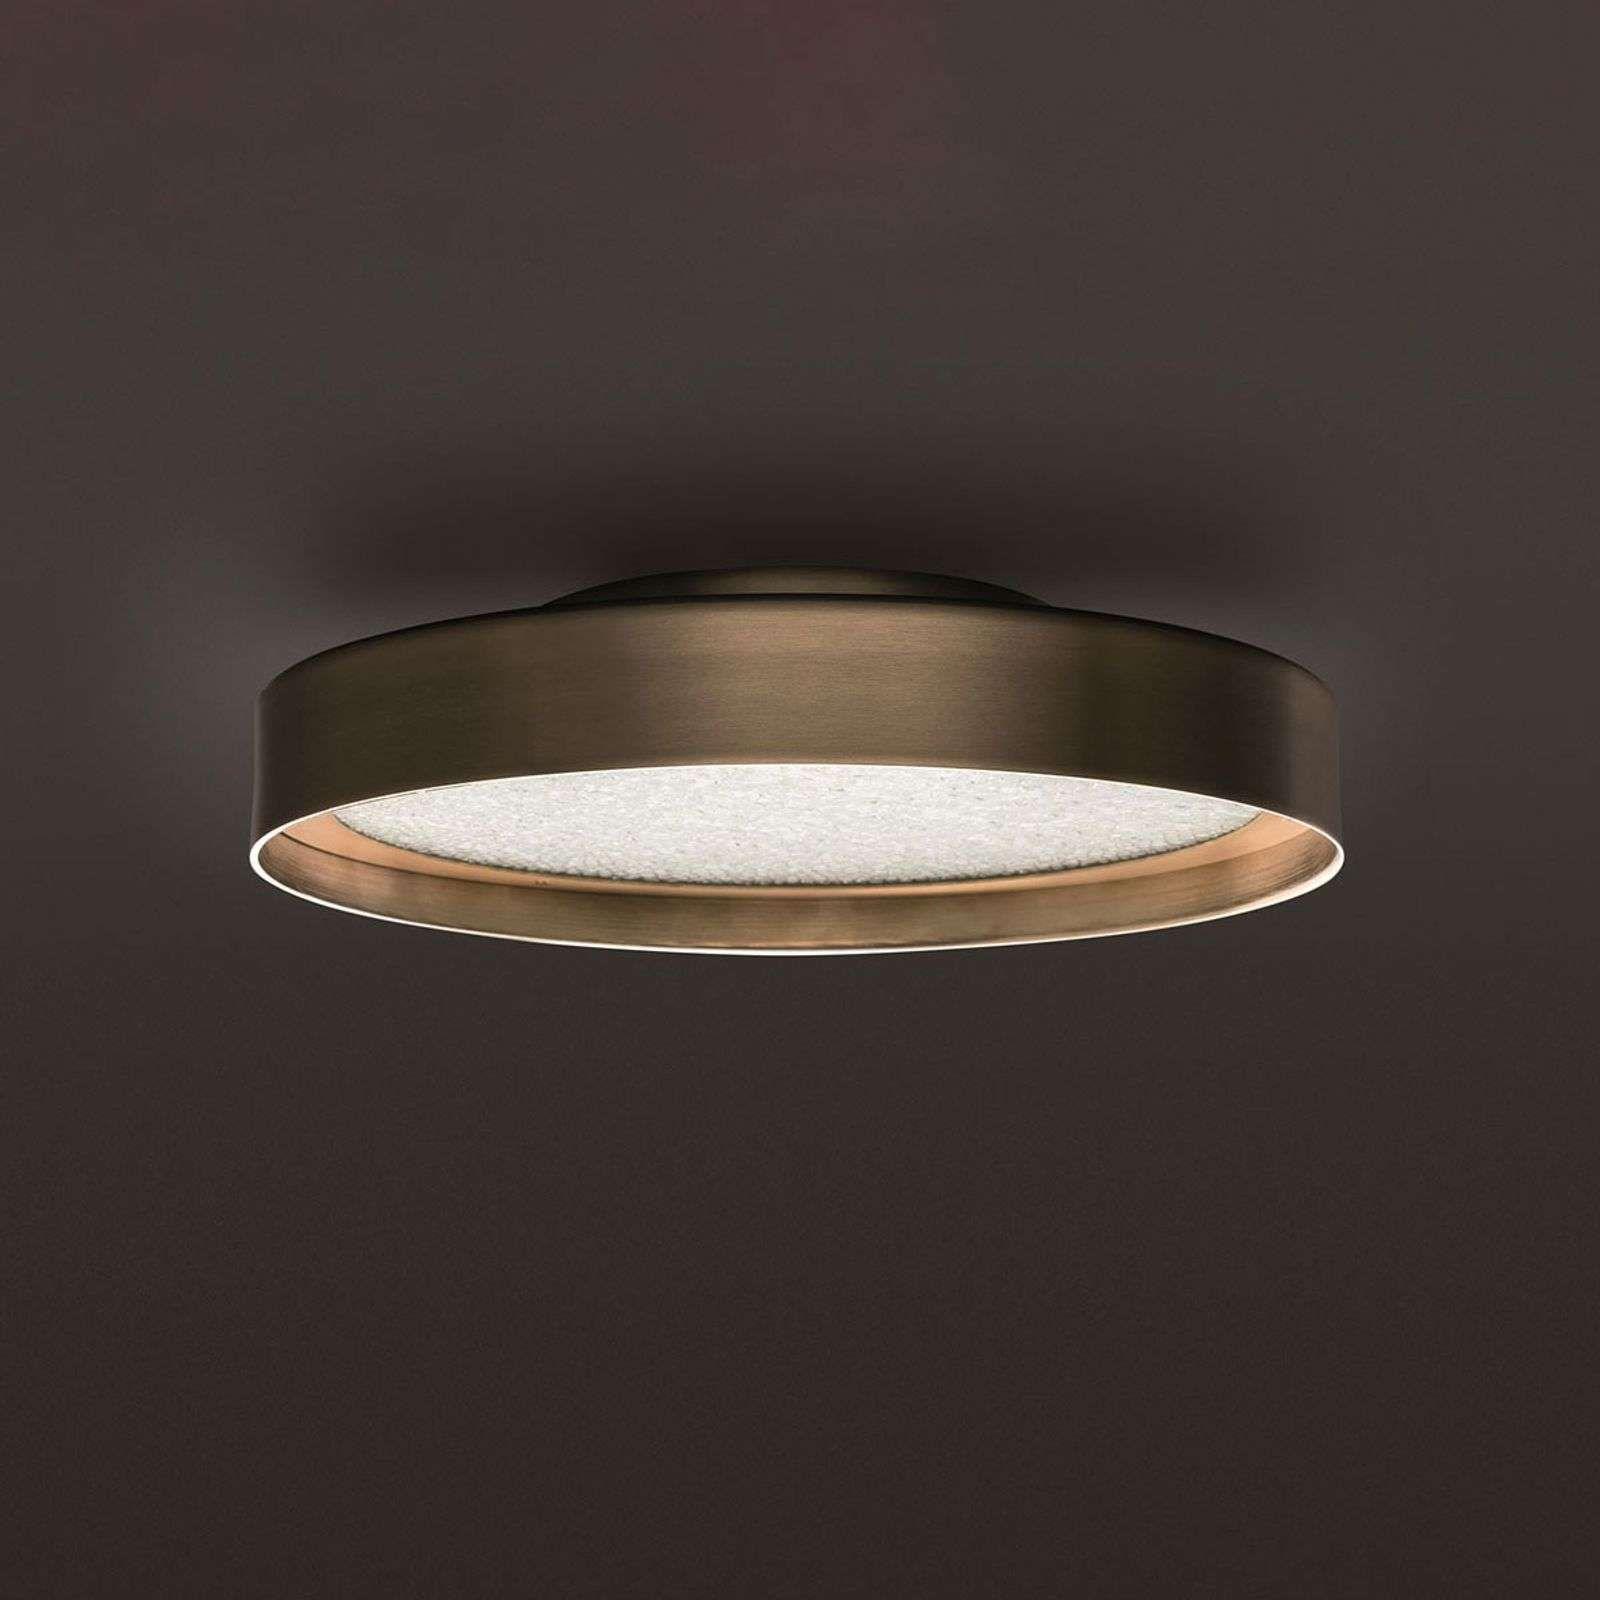 Oluce Berlin Plafondlamp Doorsnede 30 Cm In 2020 Plafondlamp Metaal Lampen24